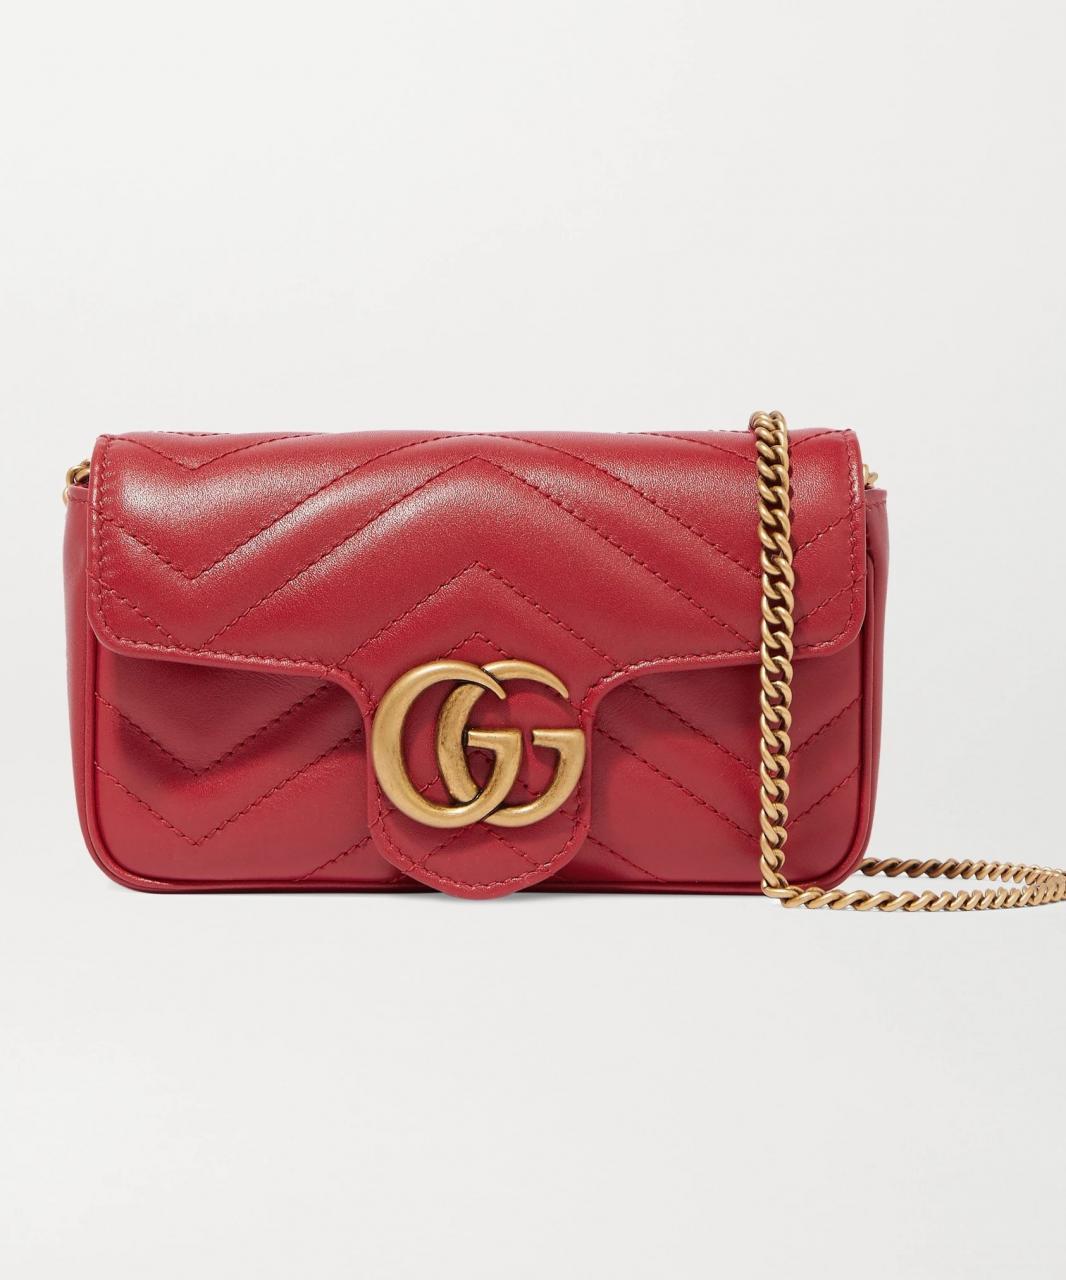 Gucci GG Marmont红色皮革小手提包